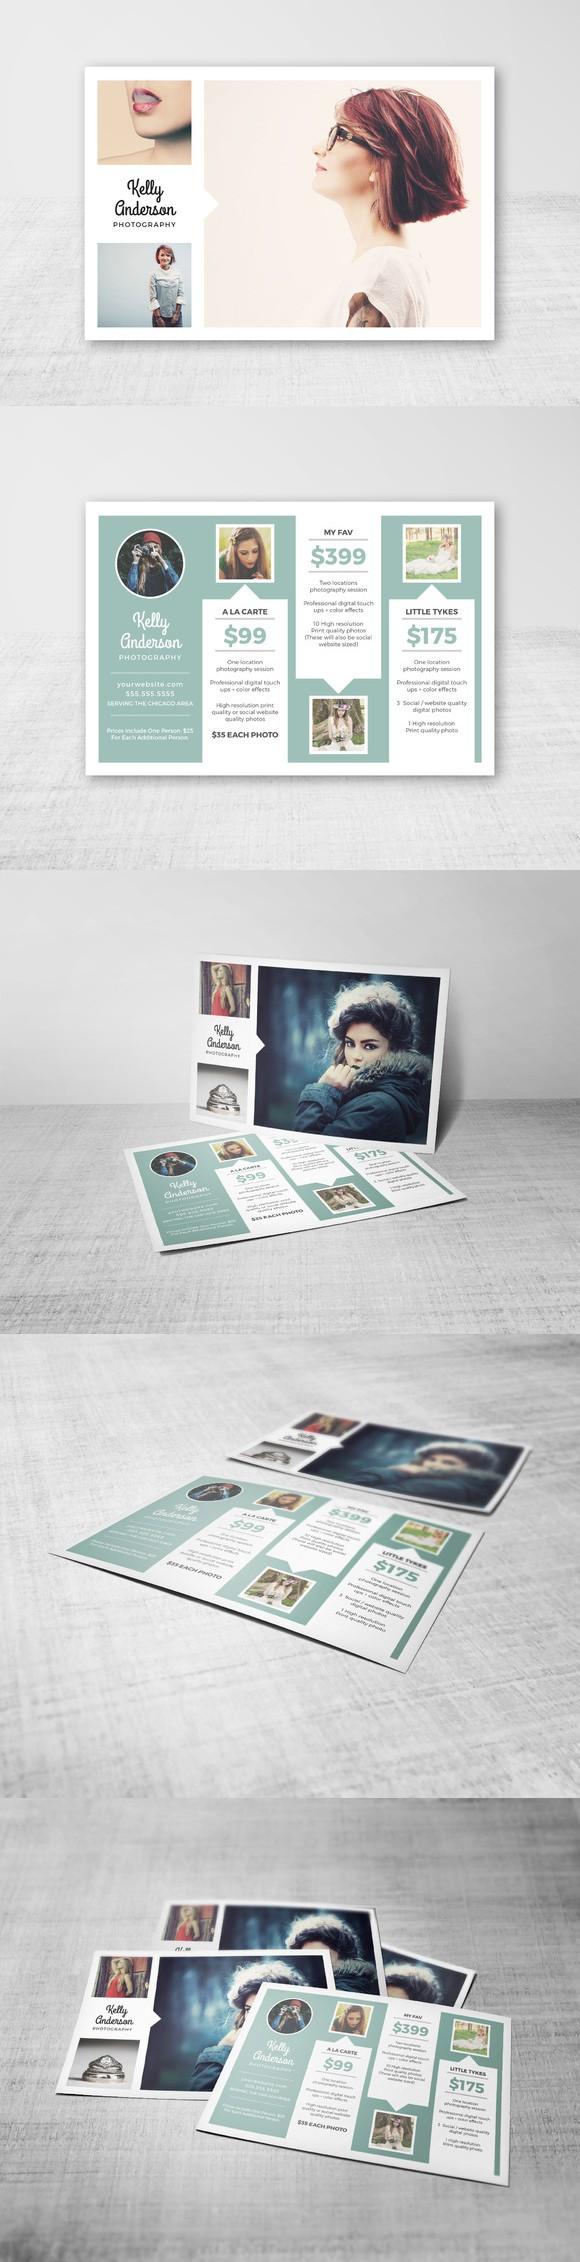 Photographer Price List Handout   Pinterest   Card templates ...